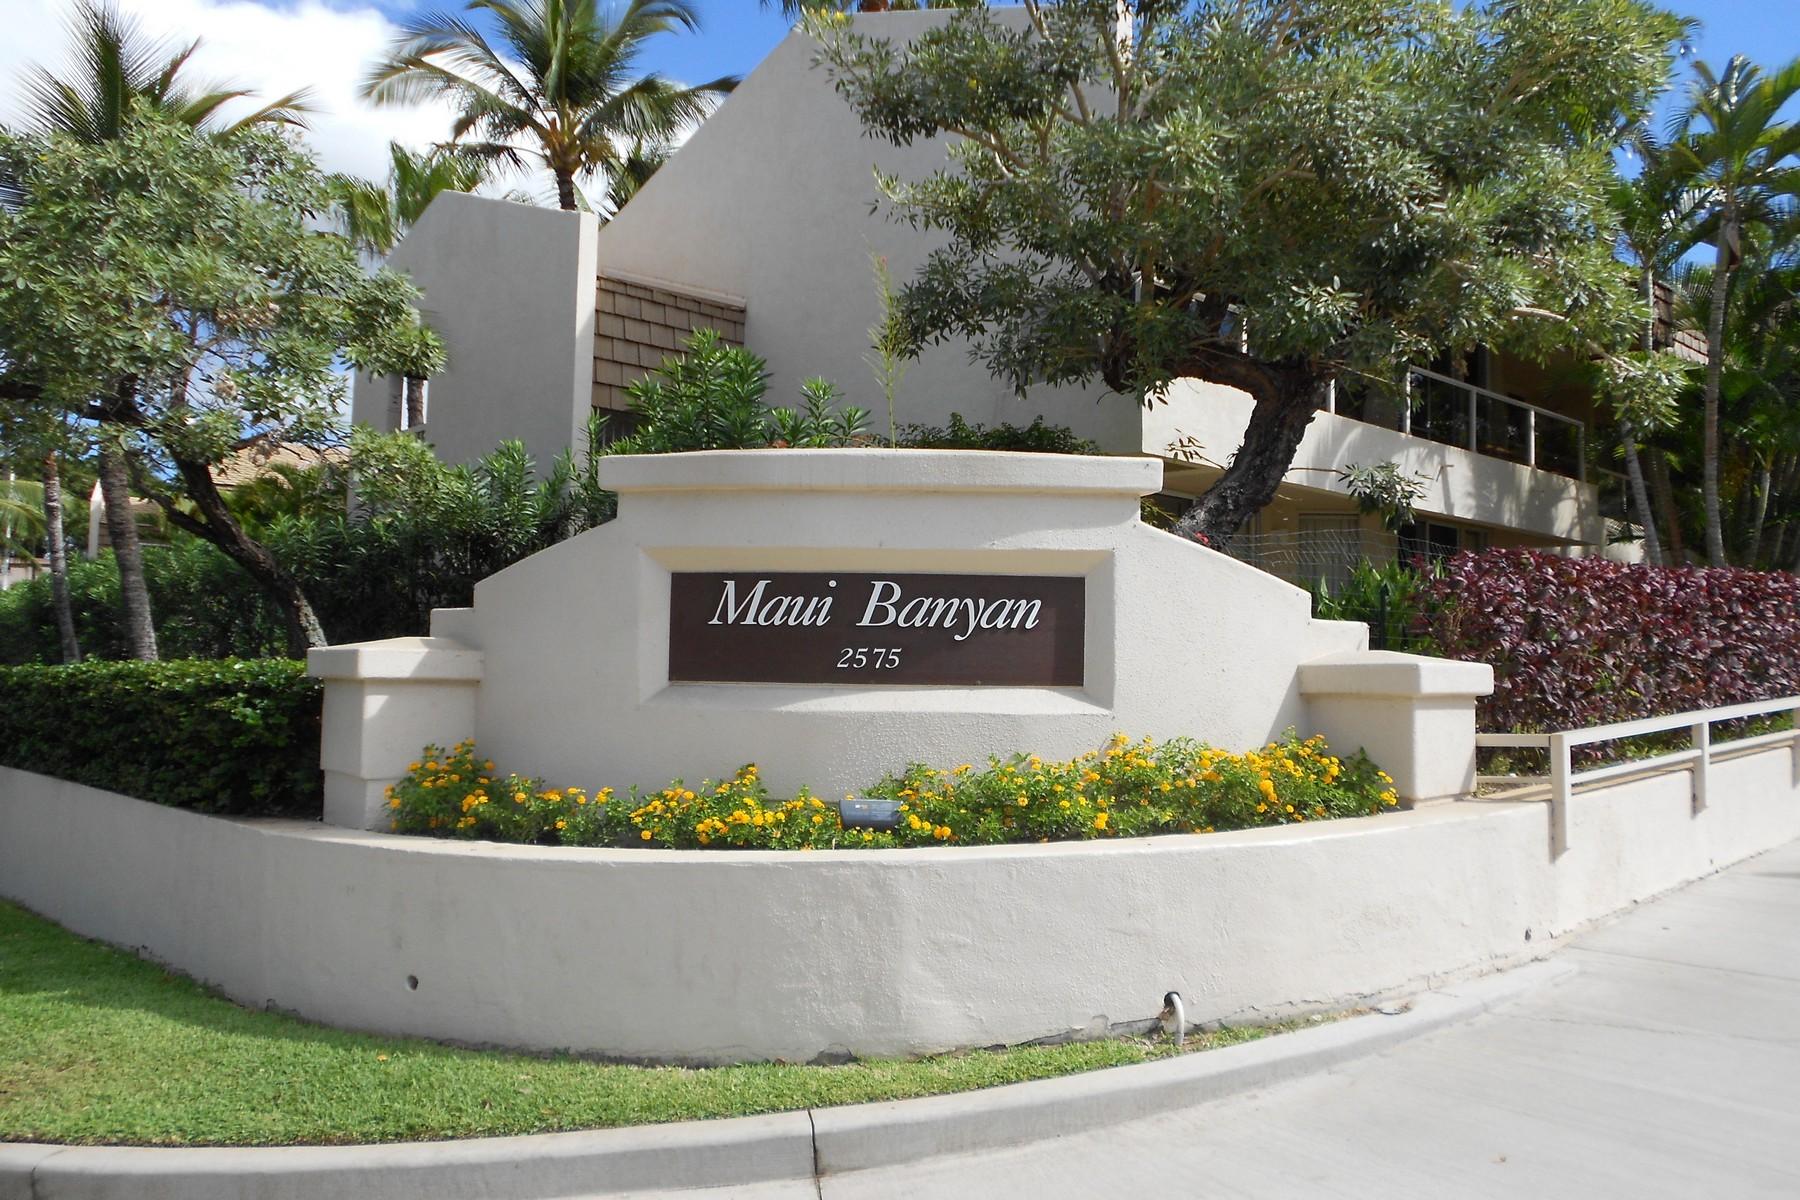 Condomínio para Venda às Maui Banyan H-210 Located Across The Street From White Sand Kamaole III Beach 2575 South Kihei Road, Maui Banyan H-210 Kihei, Havaí, 96753 Estados Unidos